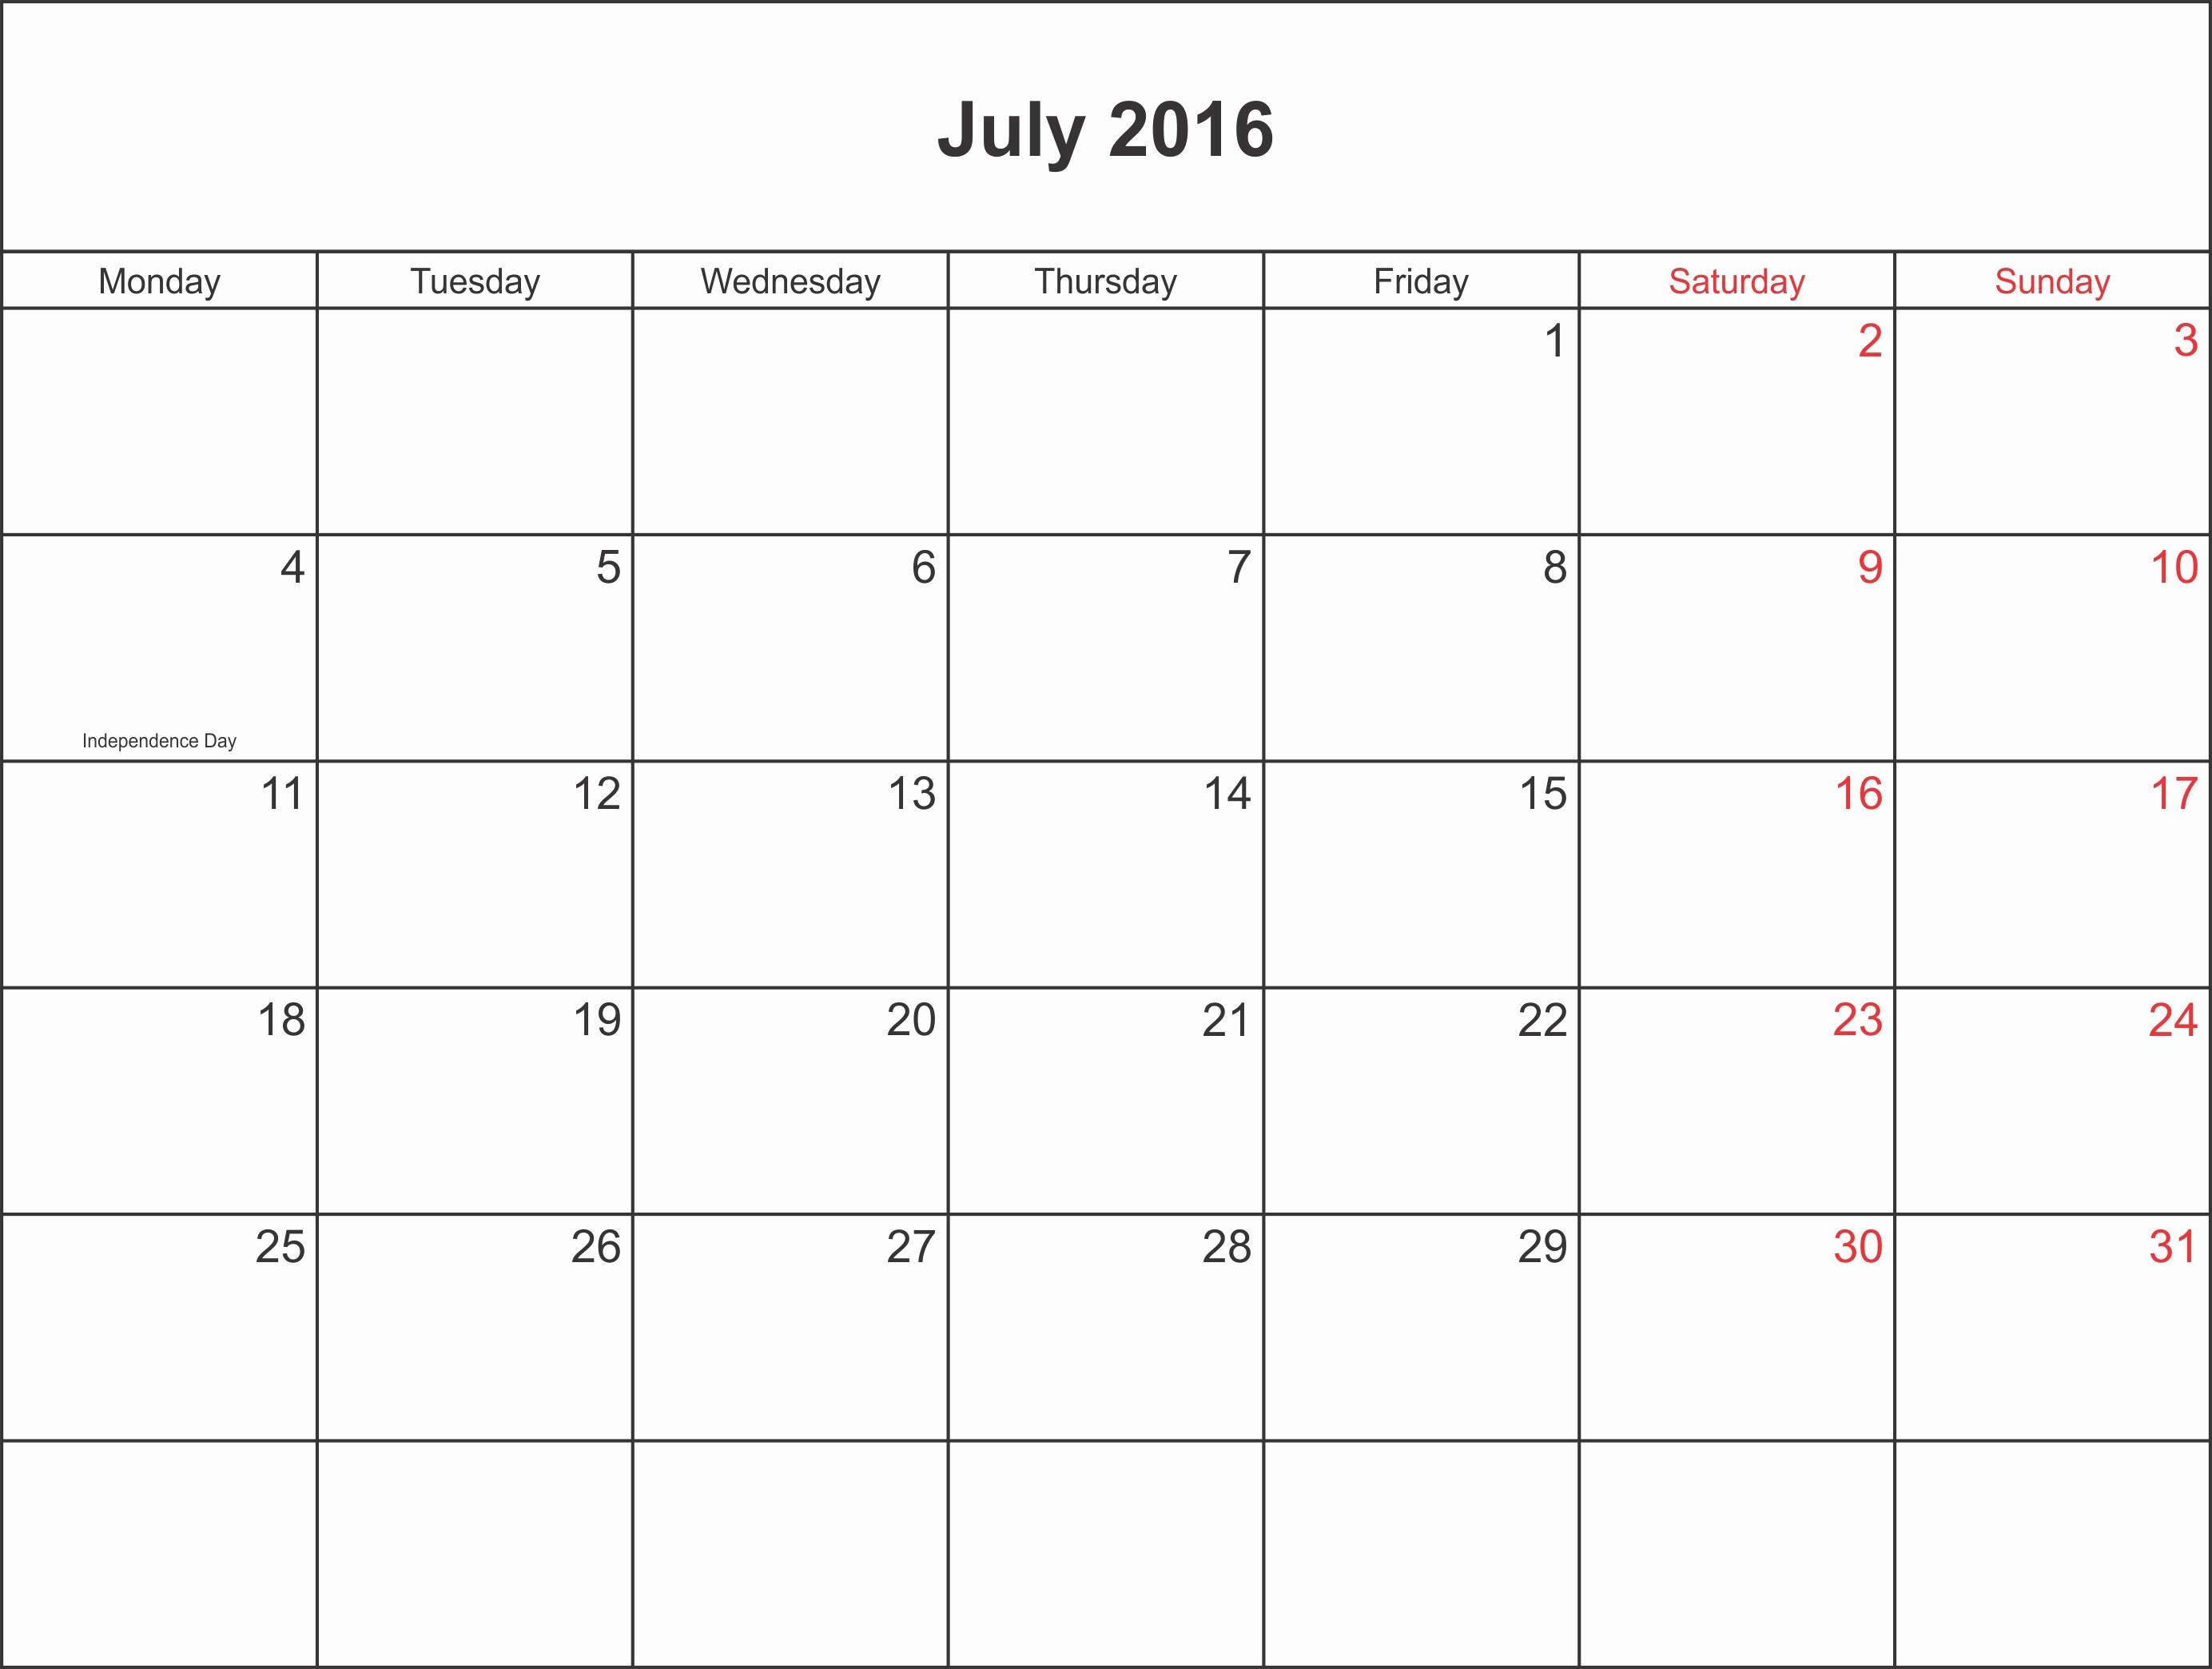 Calendar 2016 Printable with Holidays Elegant July 2016 Calendar Printable with Holidays Pdf and Jpg